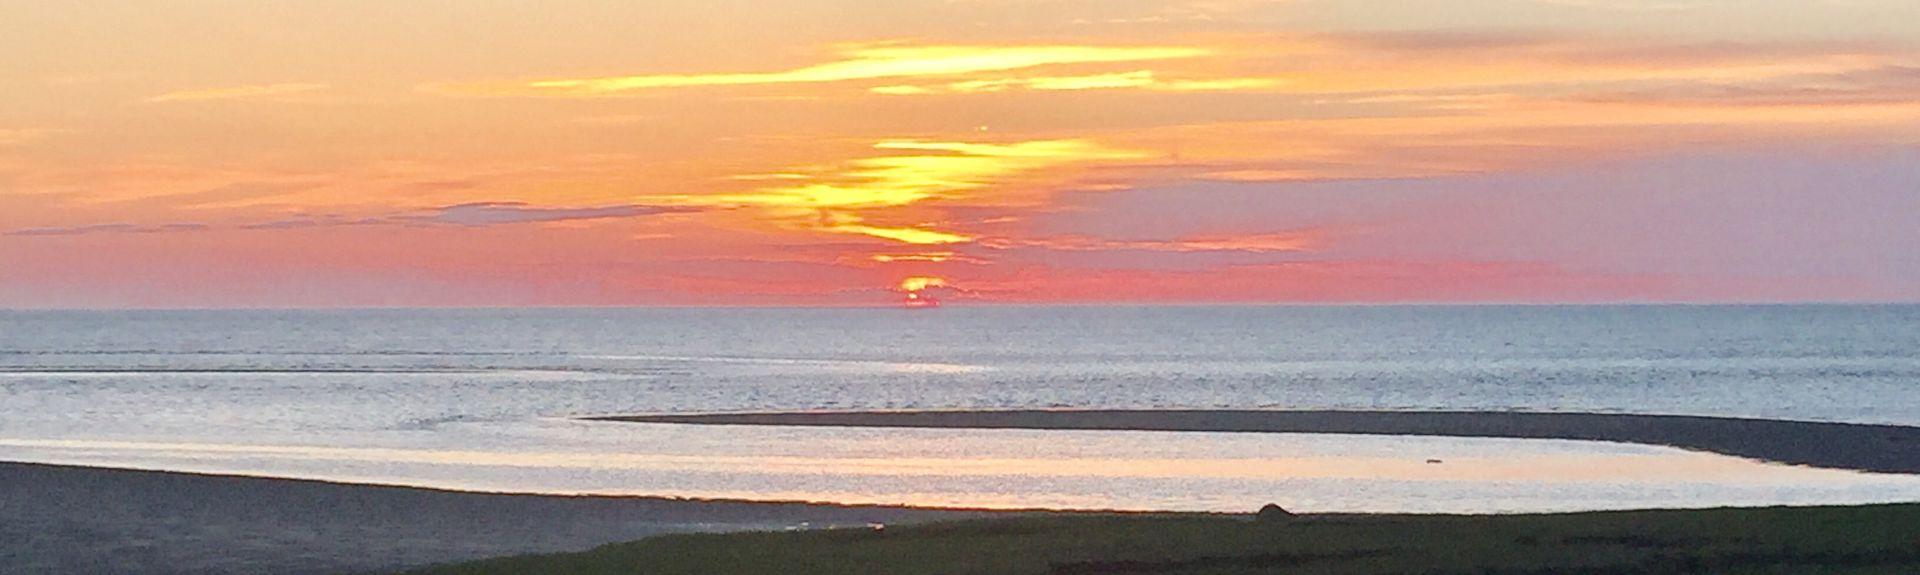 Englewood Beach, West Yarmouth, Massachusetts, United States of America